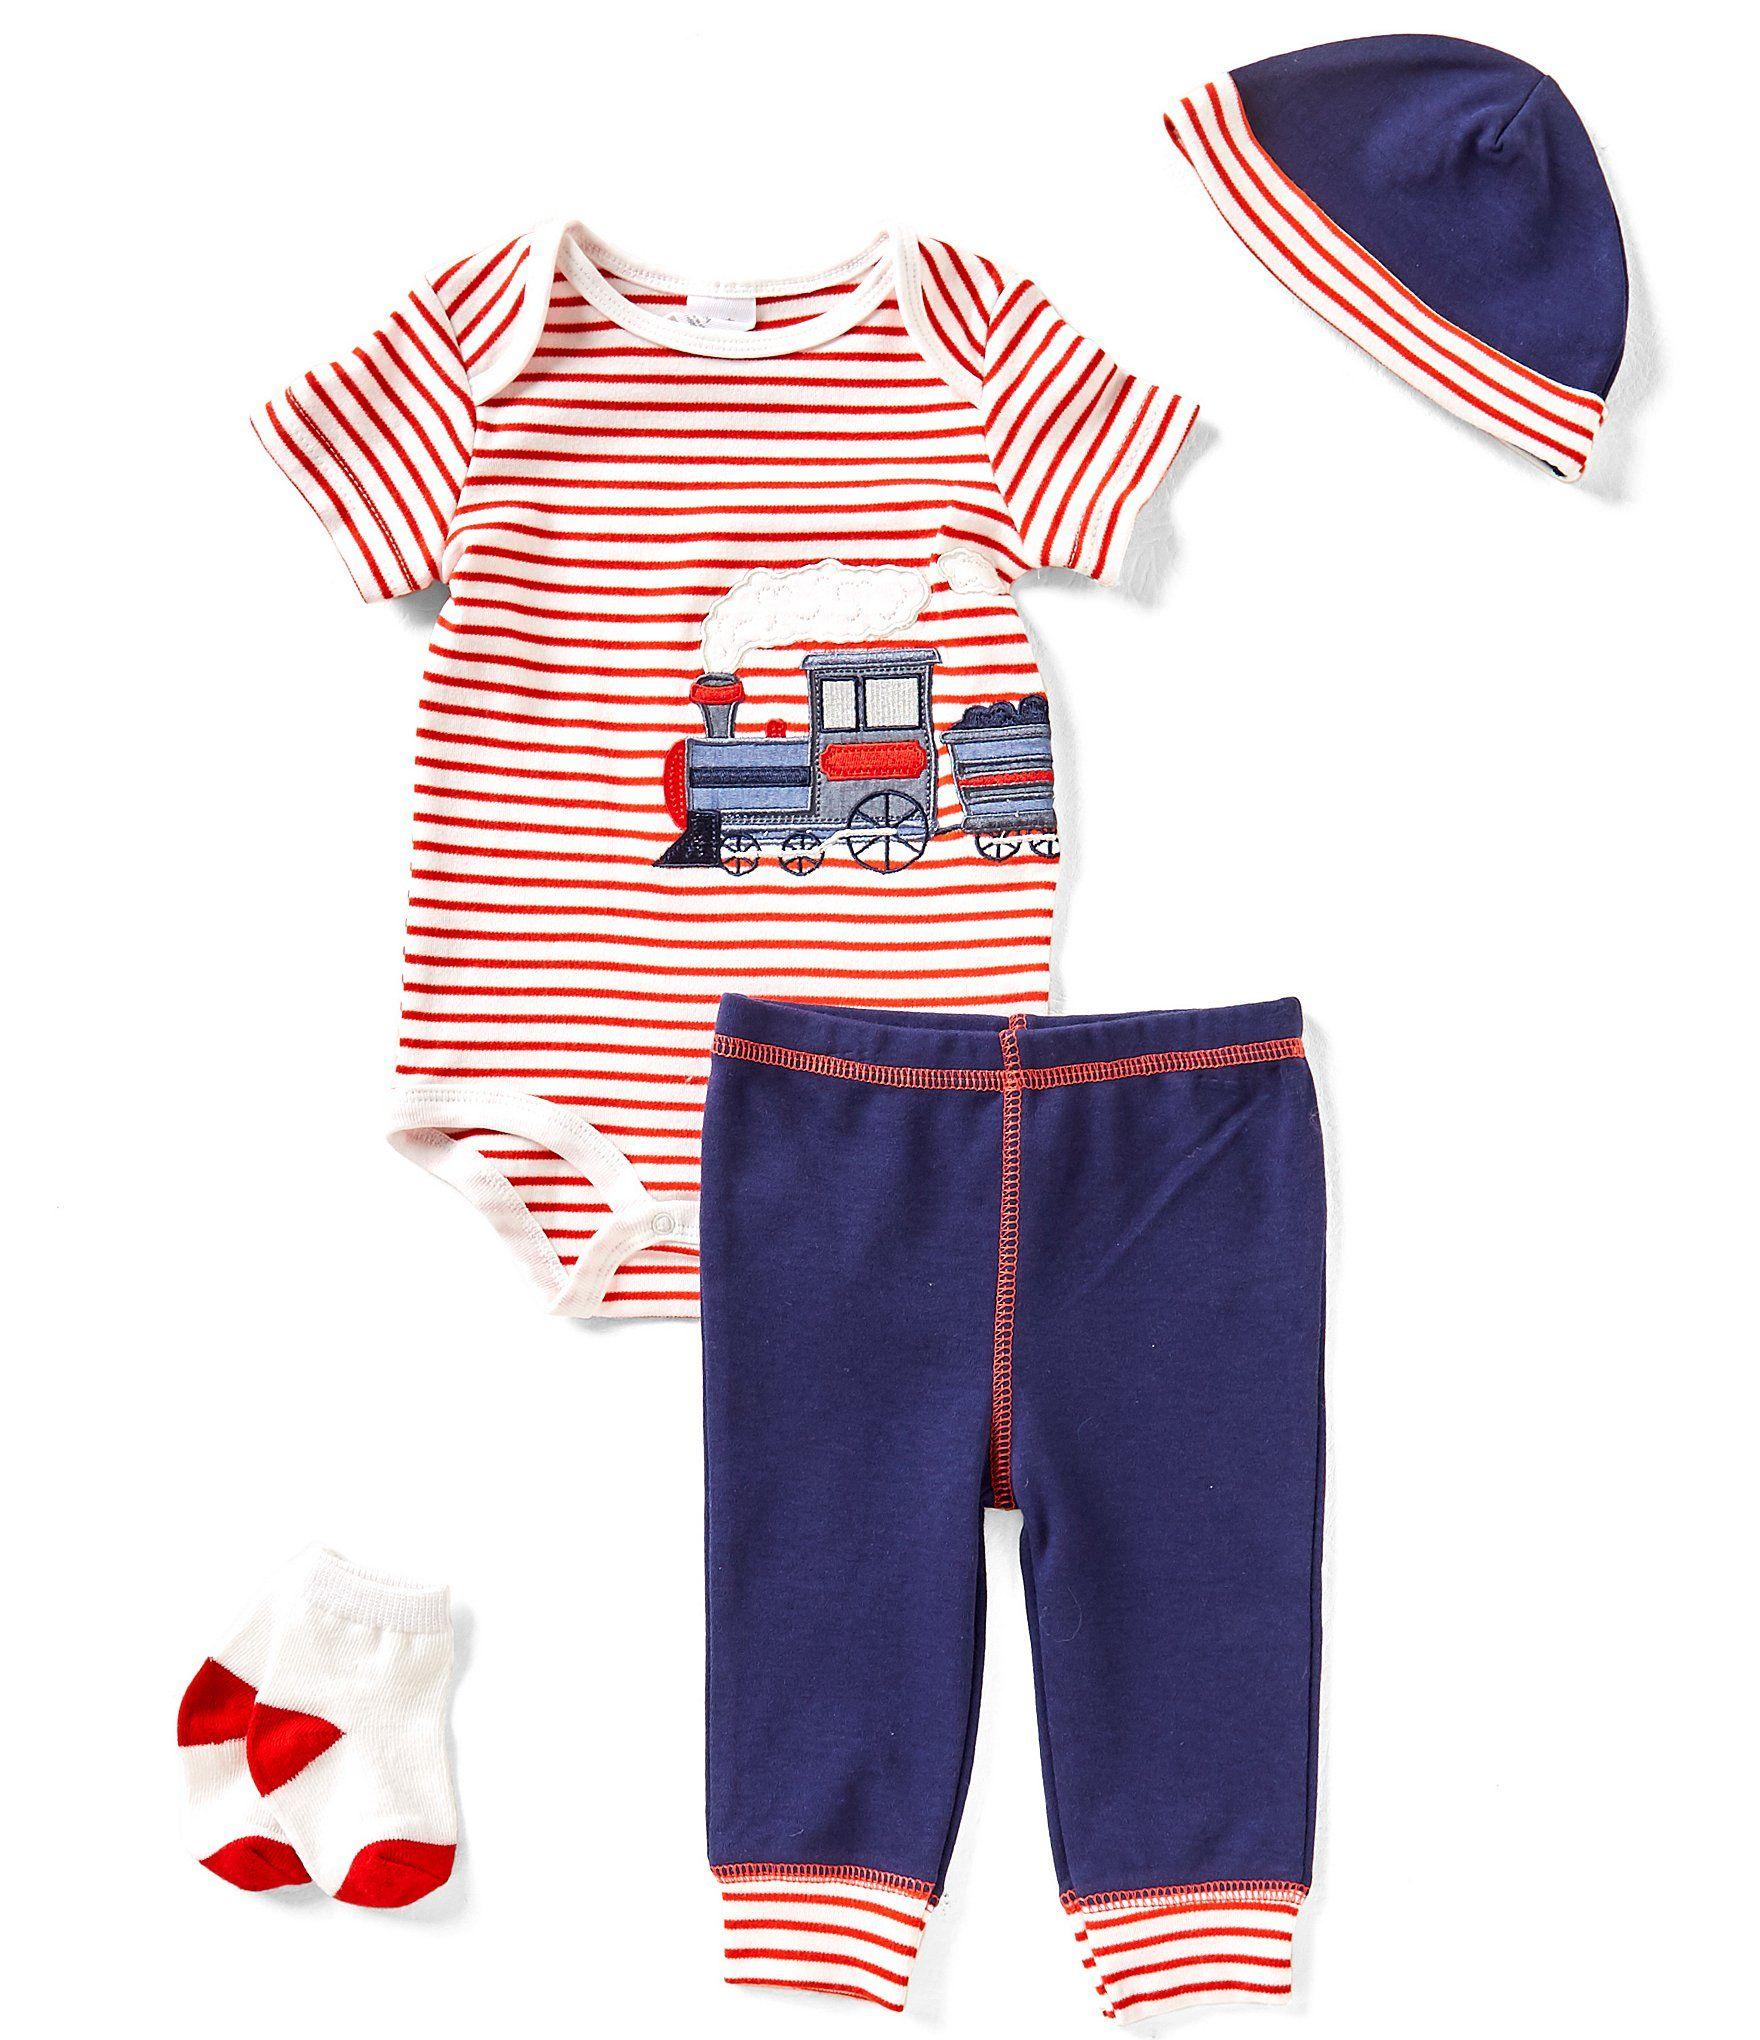 Starting Out Baby Boys Newborn 9 Months Striped Train 4 Piece